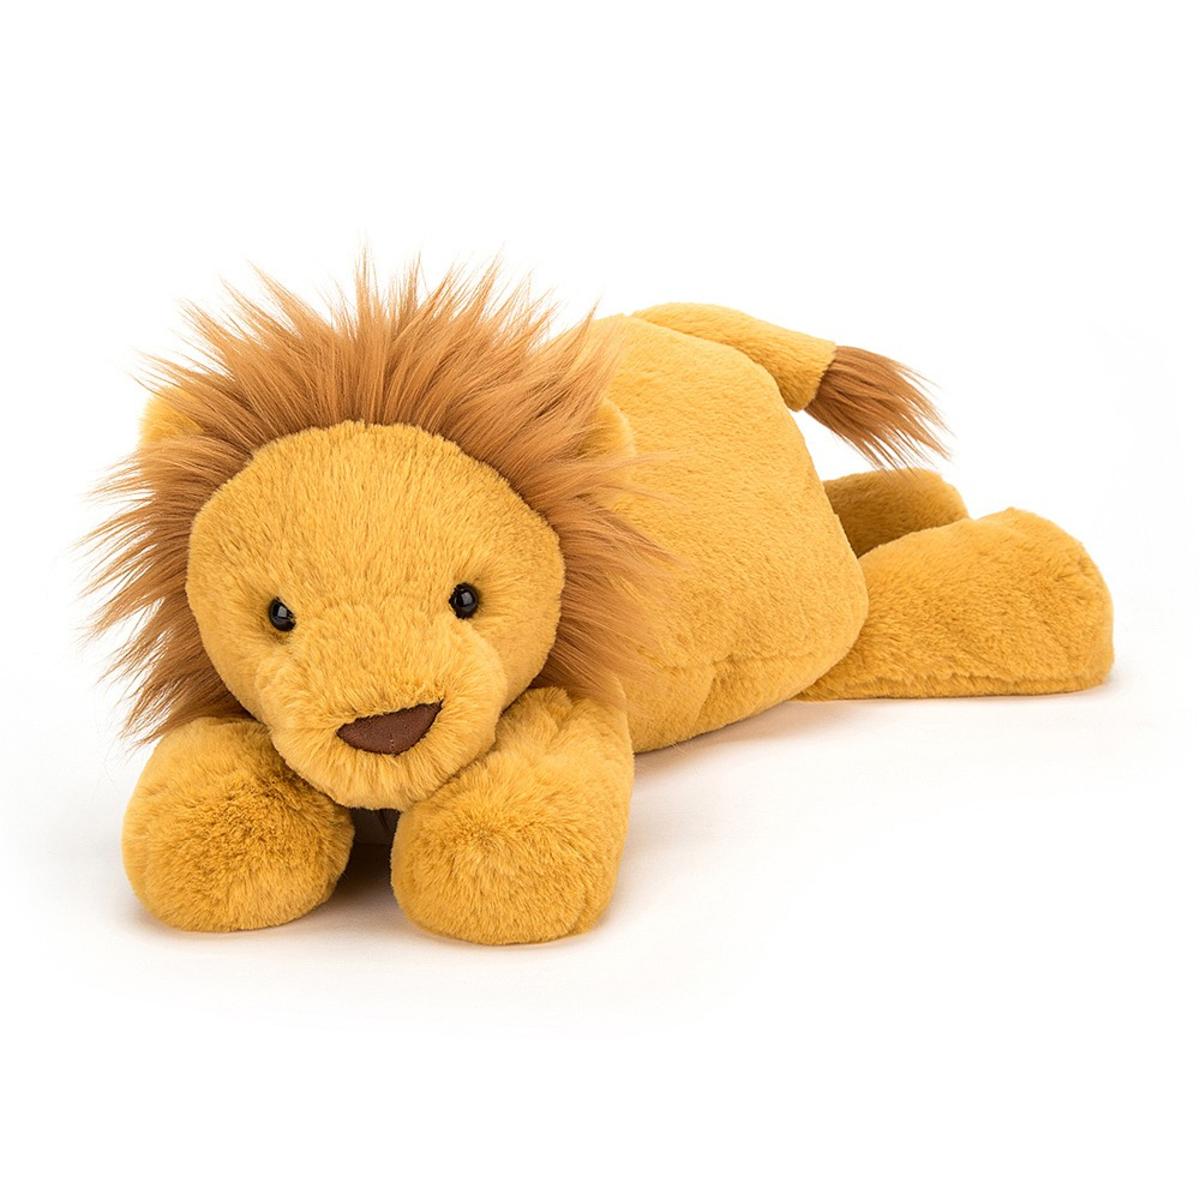 Peluche Peluche Smudge Lion 56 cm Peluche Smudge Lion 56 cm